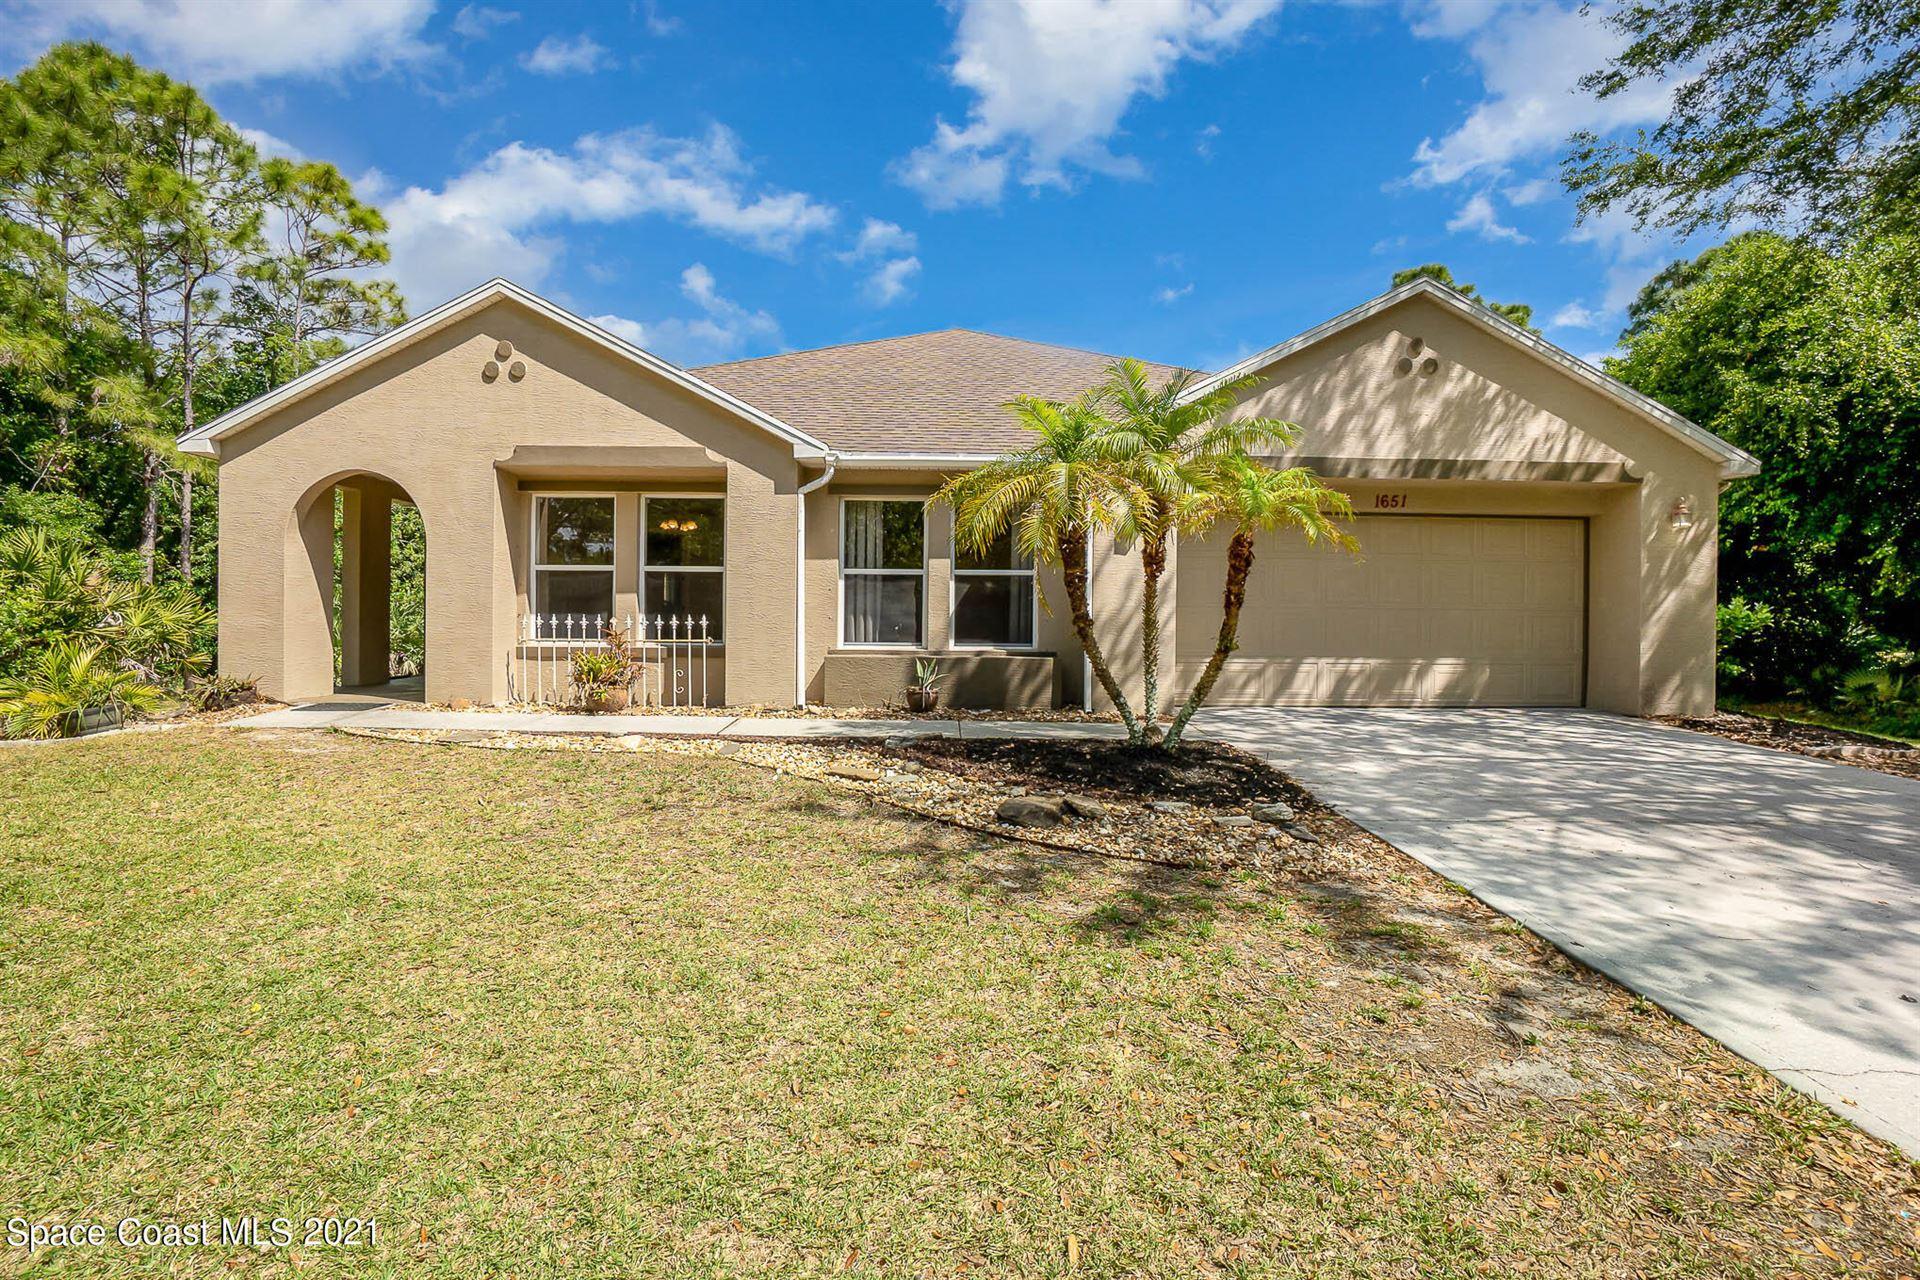 1651 Whittier Street, Palm Bay, FL 32909 - #: 900875